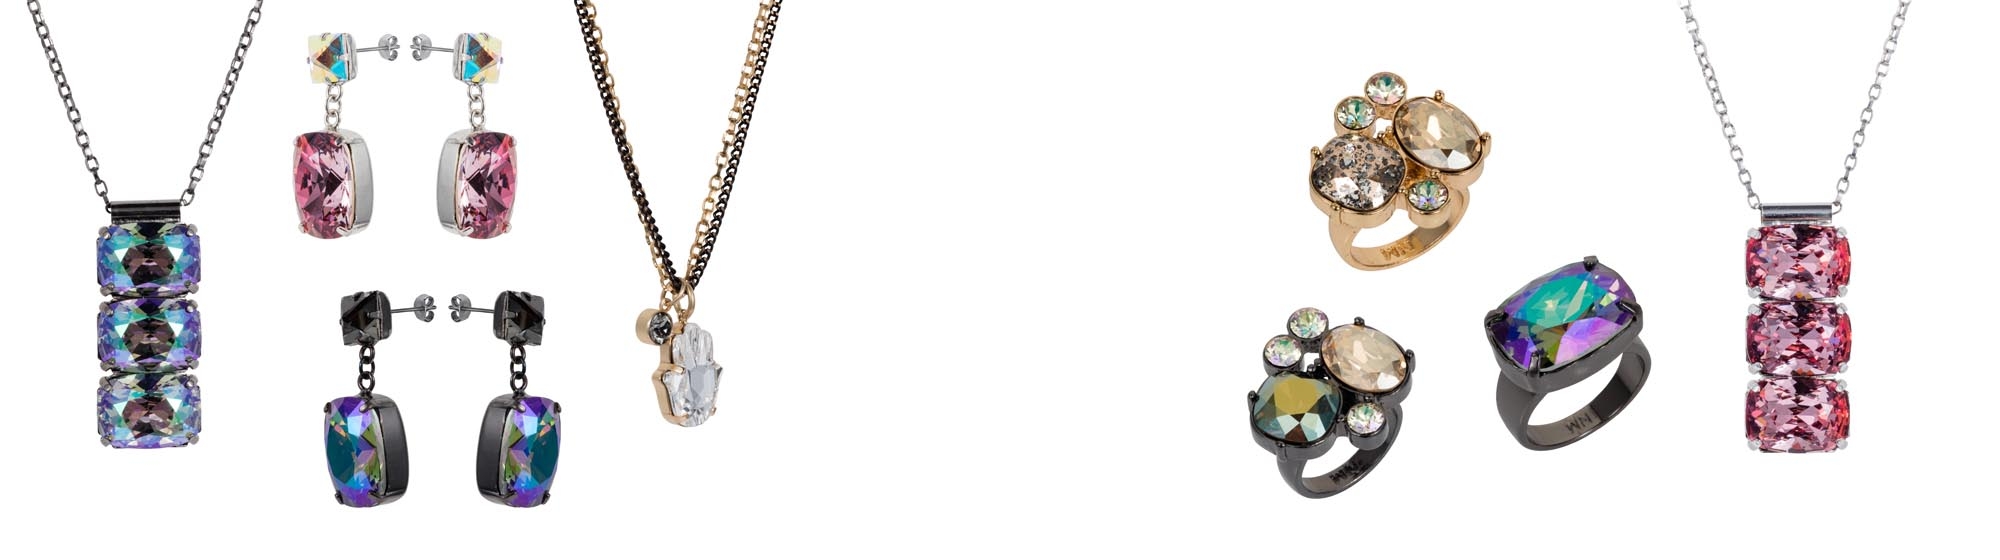 ss16-jewellery-slider